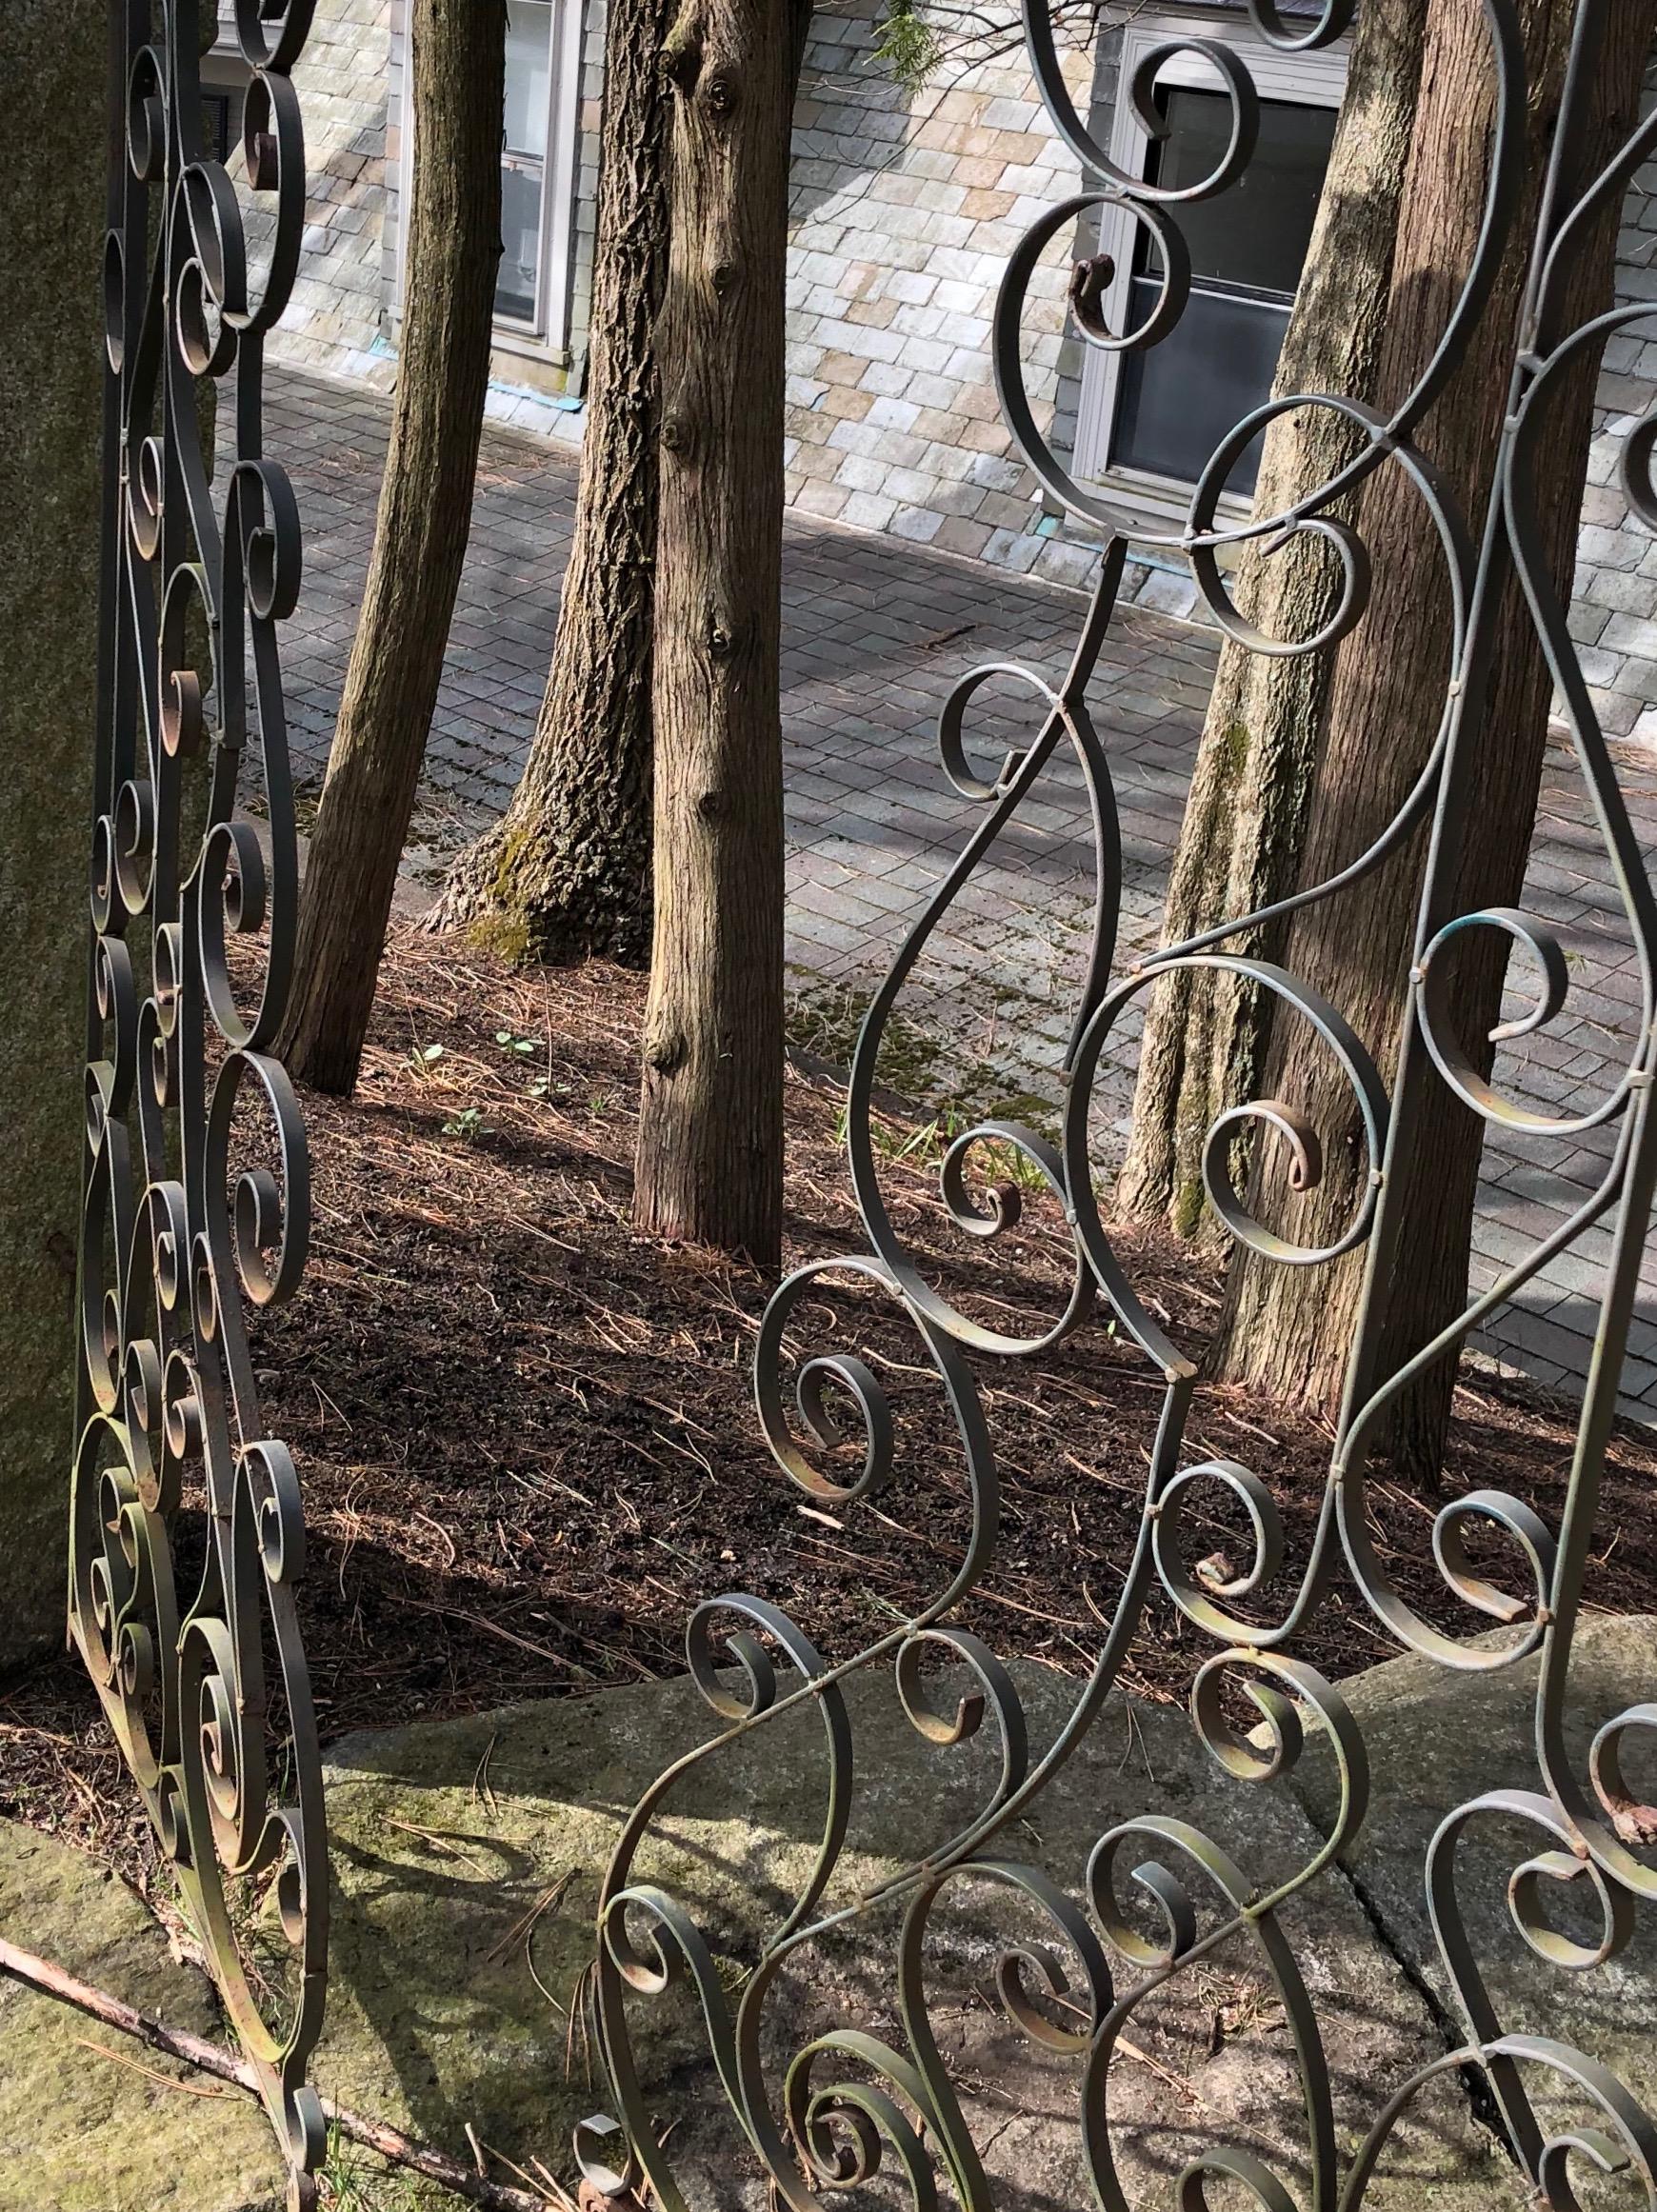 041919-curlicue-gate